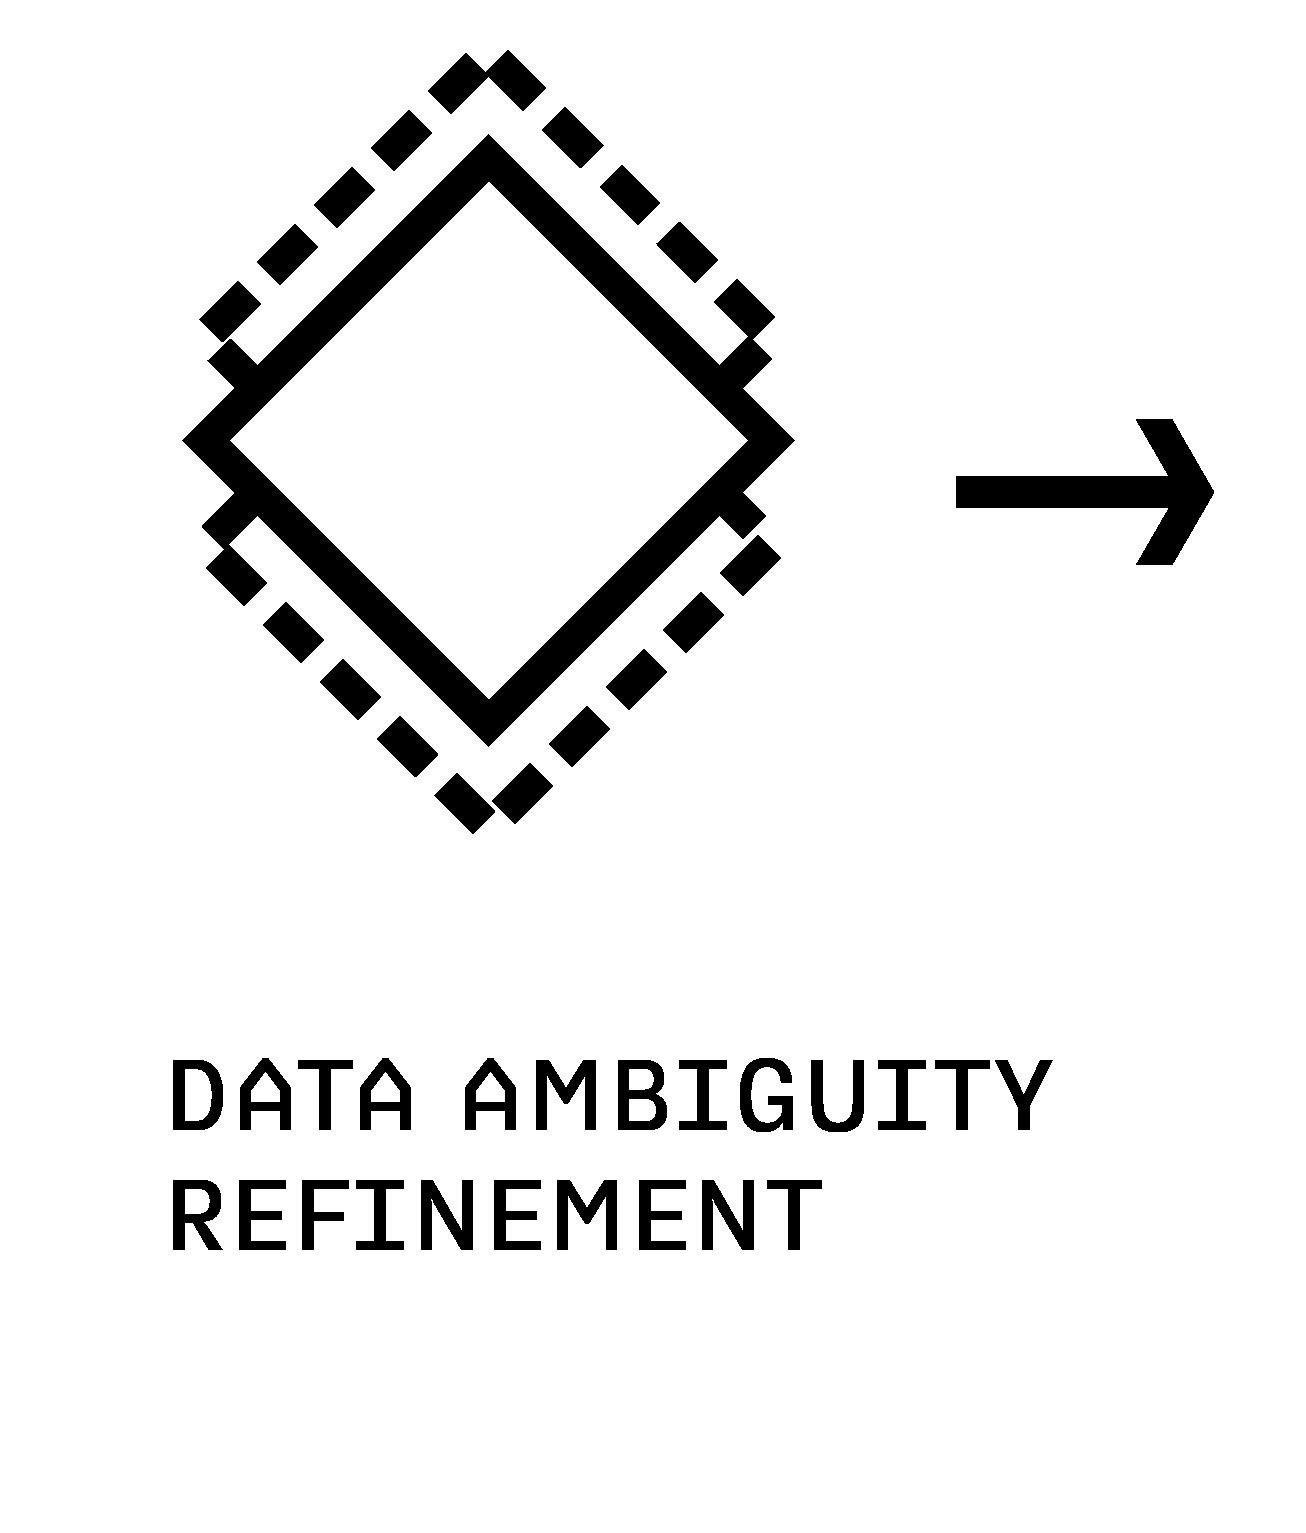 Data Ambiguity Refinement icon